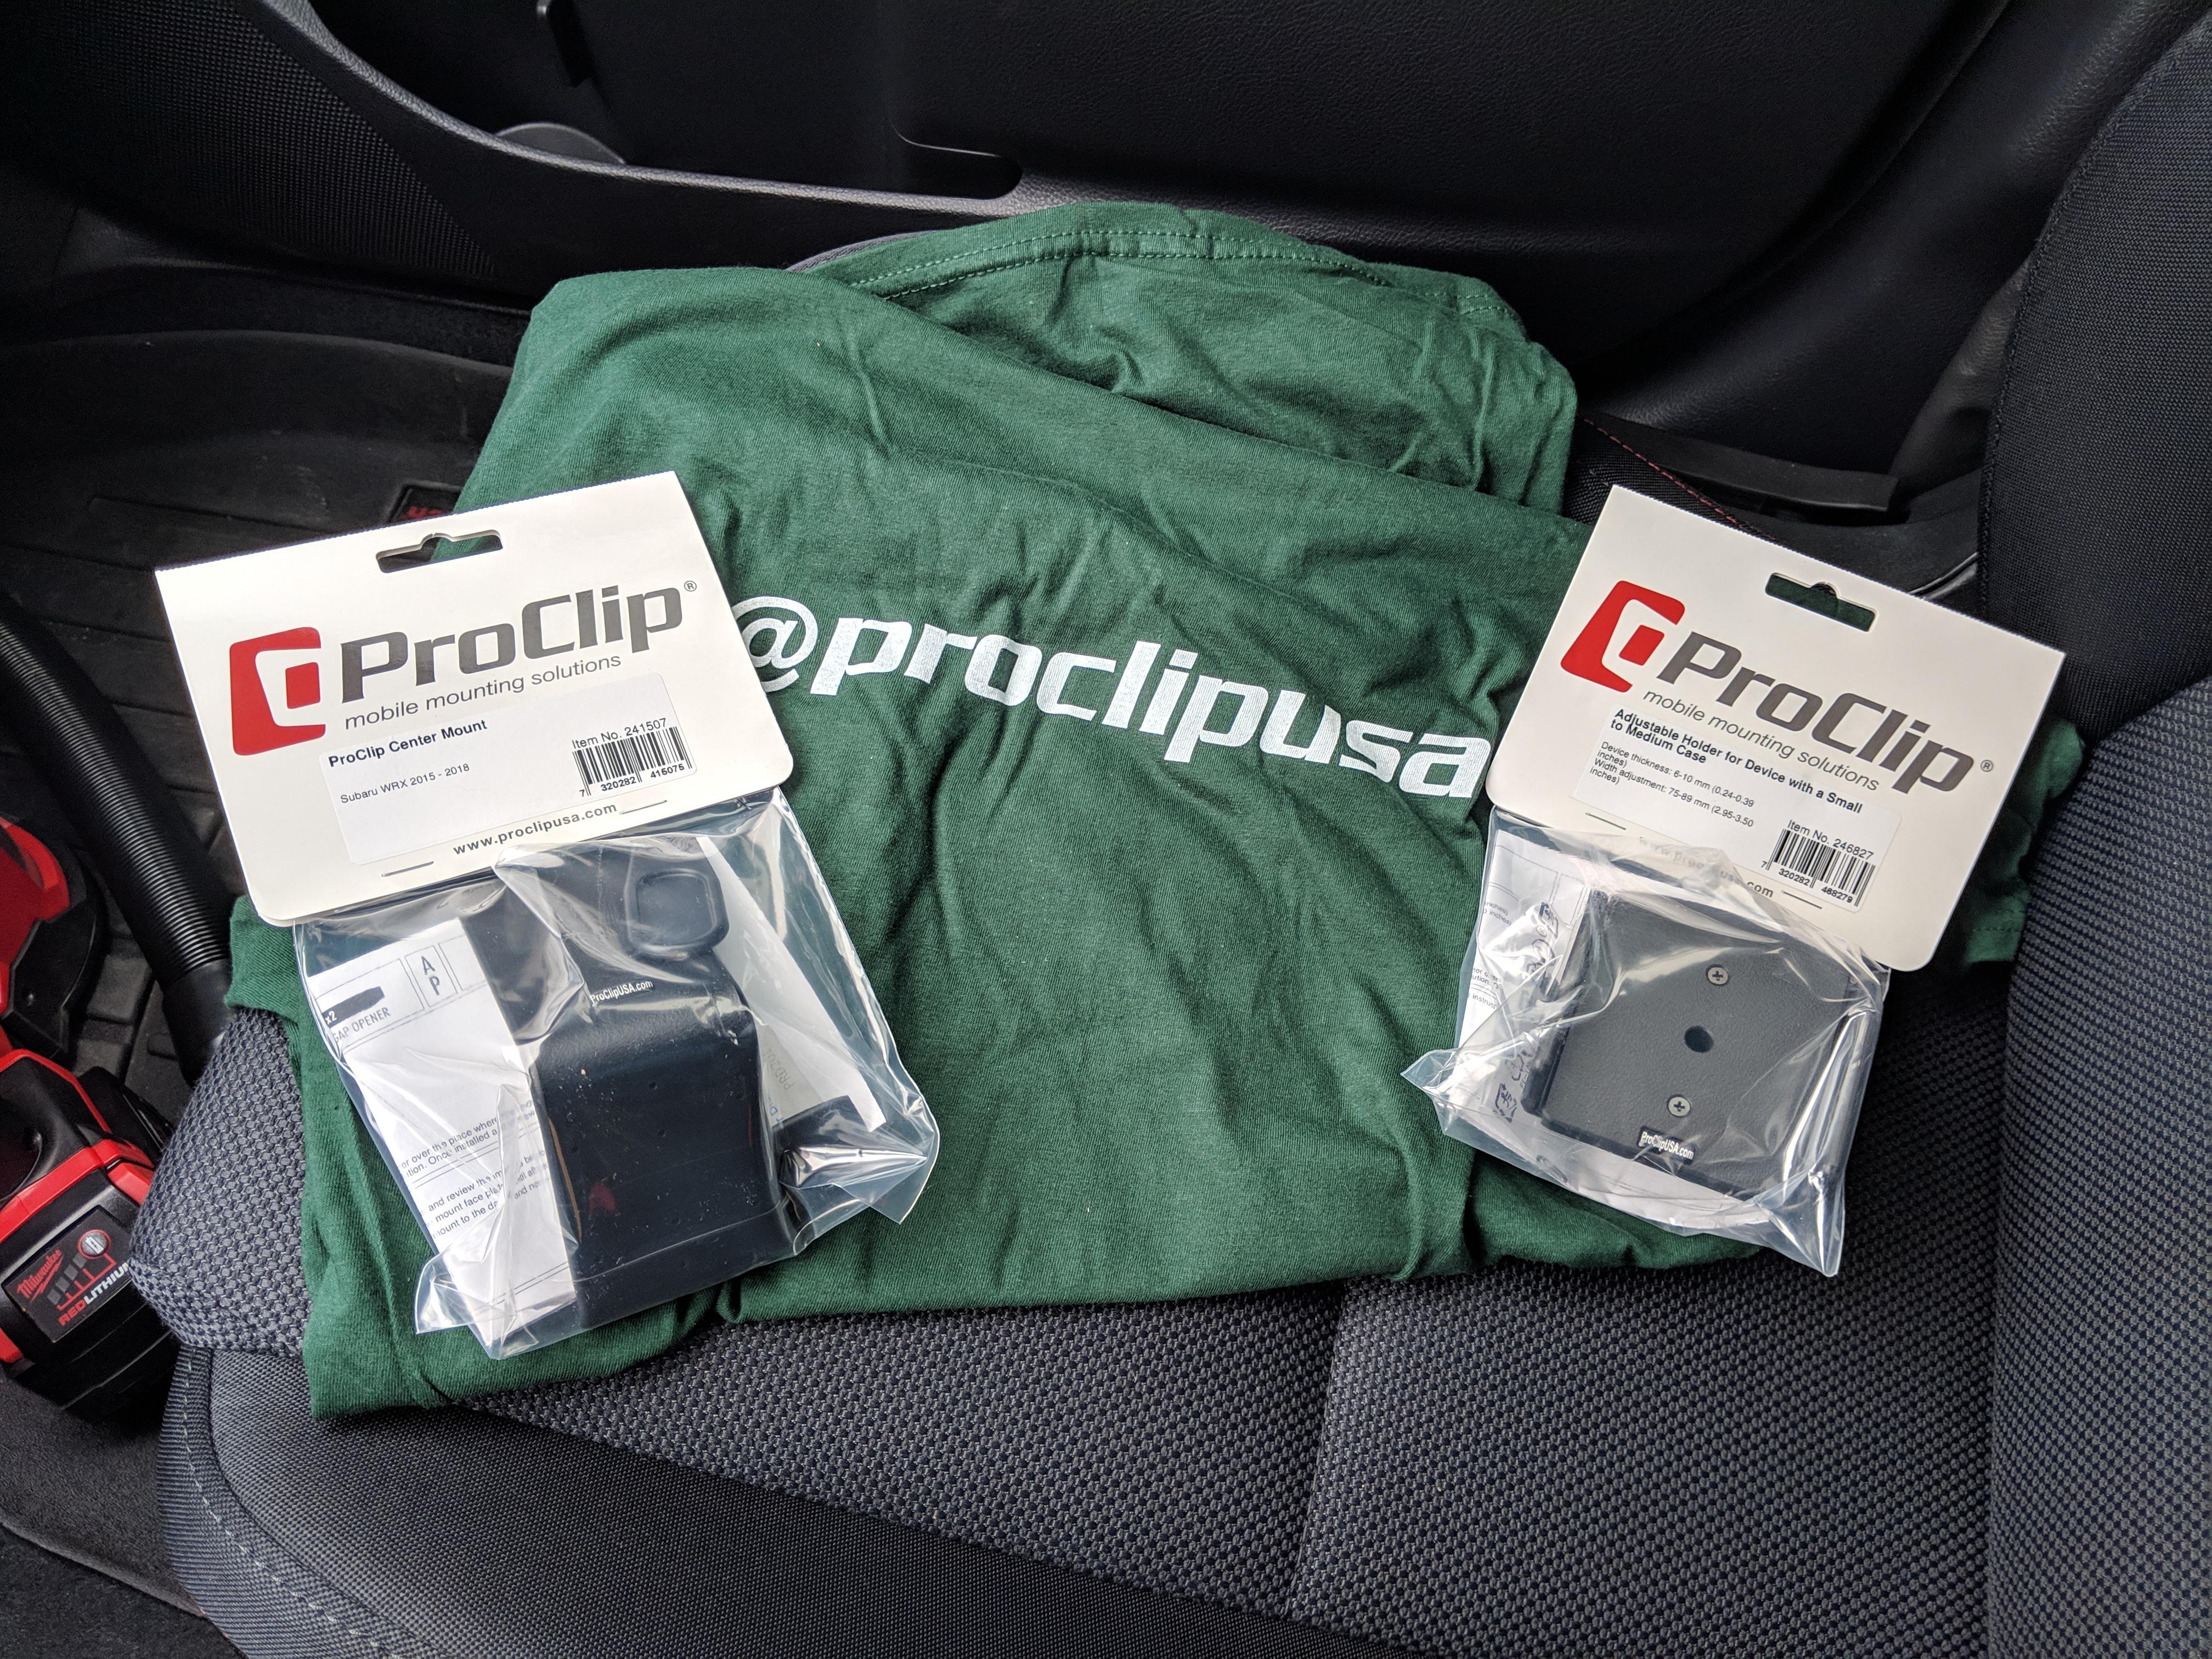 ProClip goodies